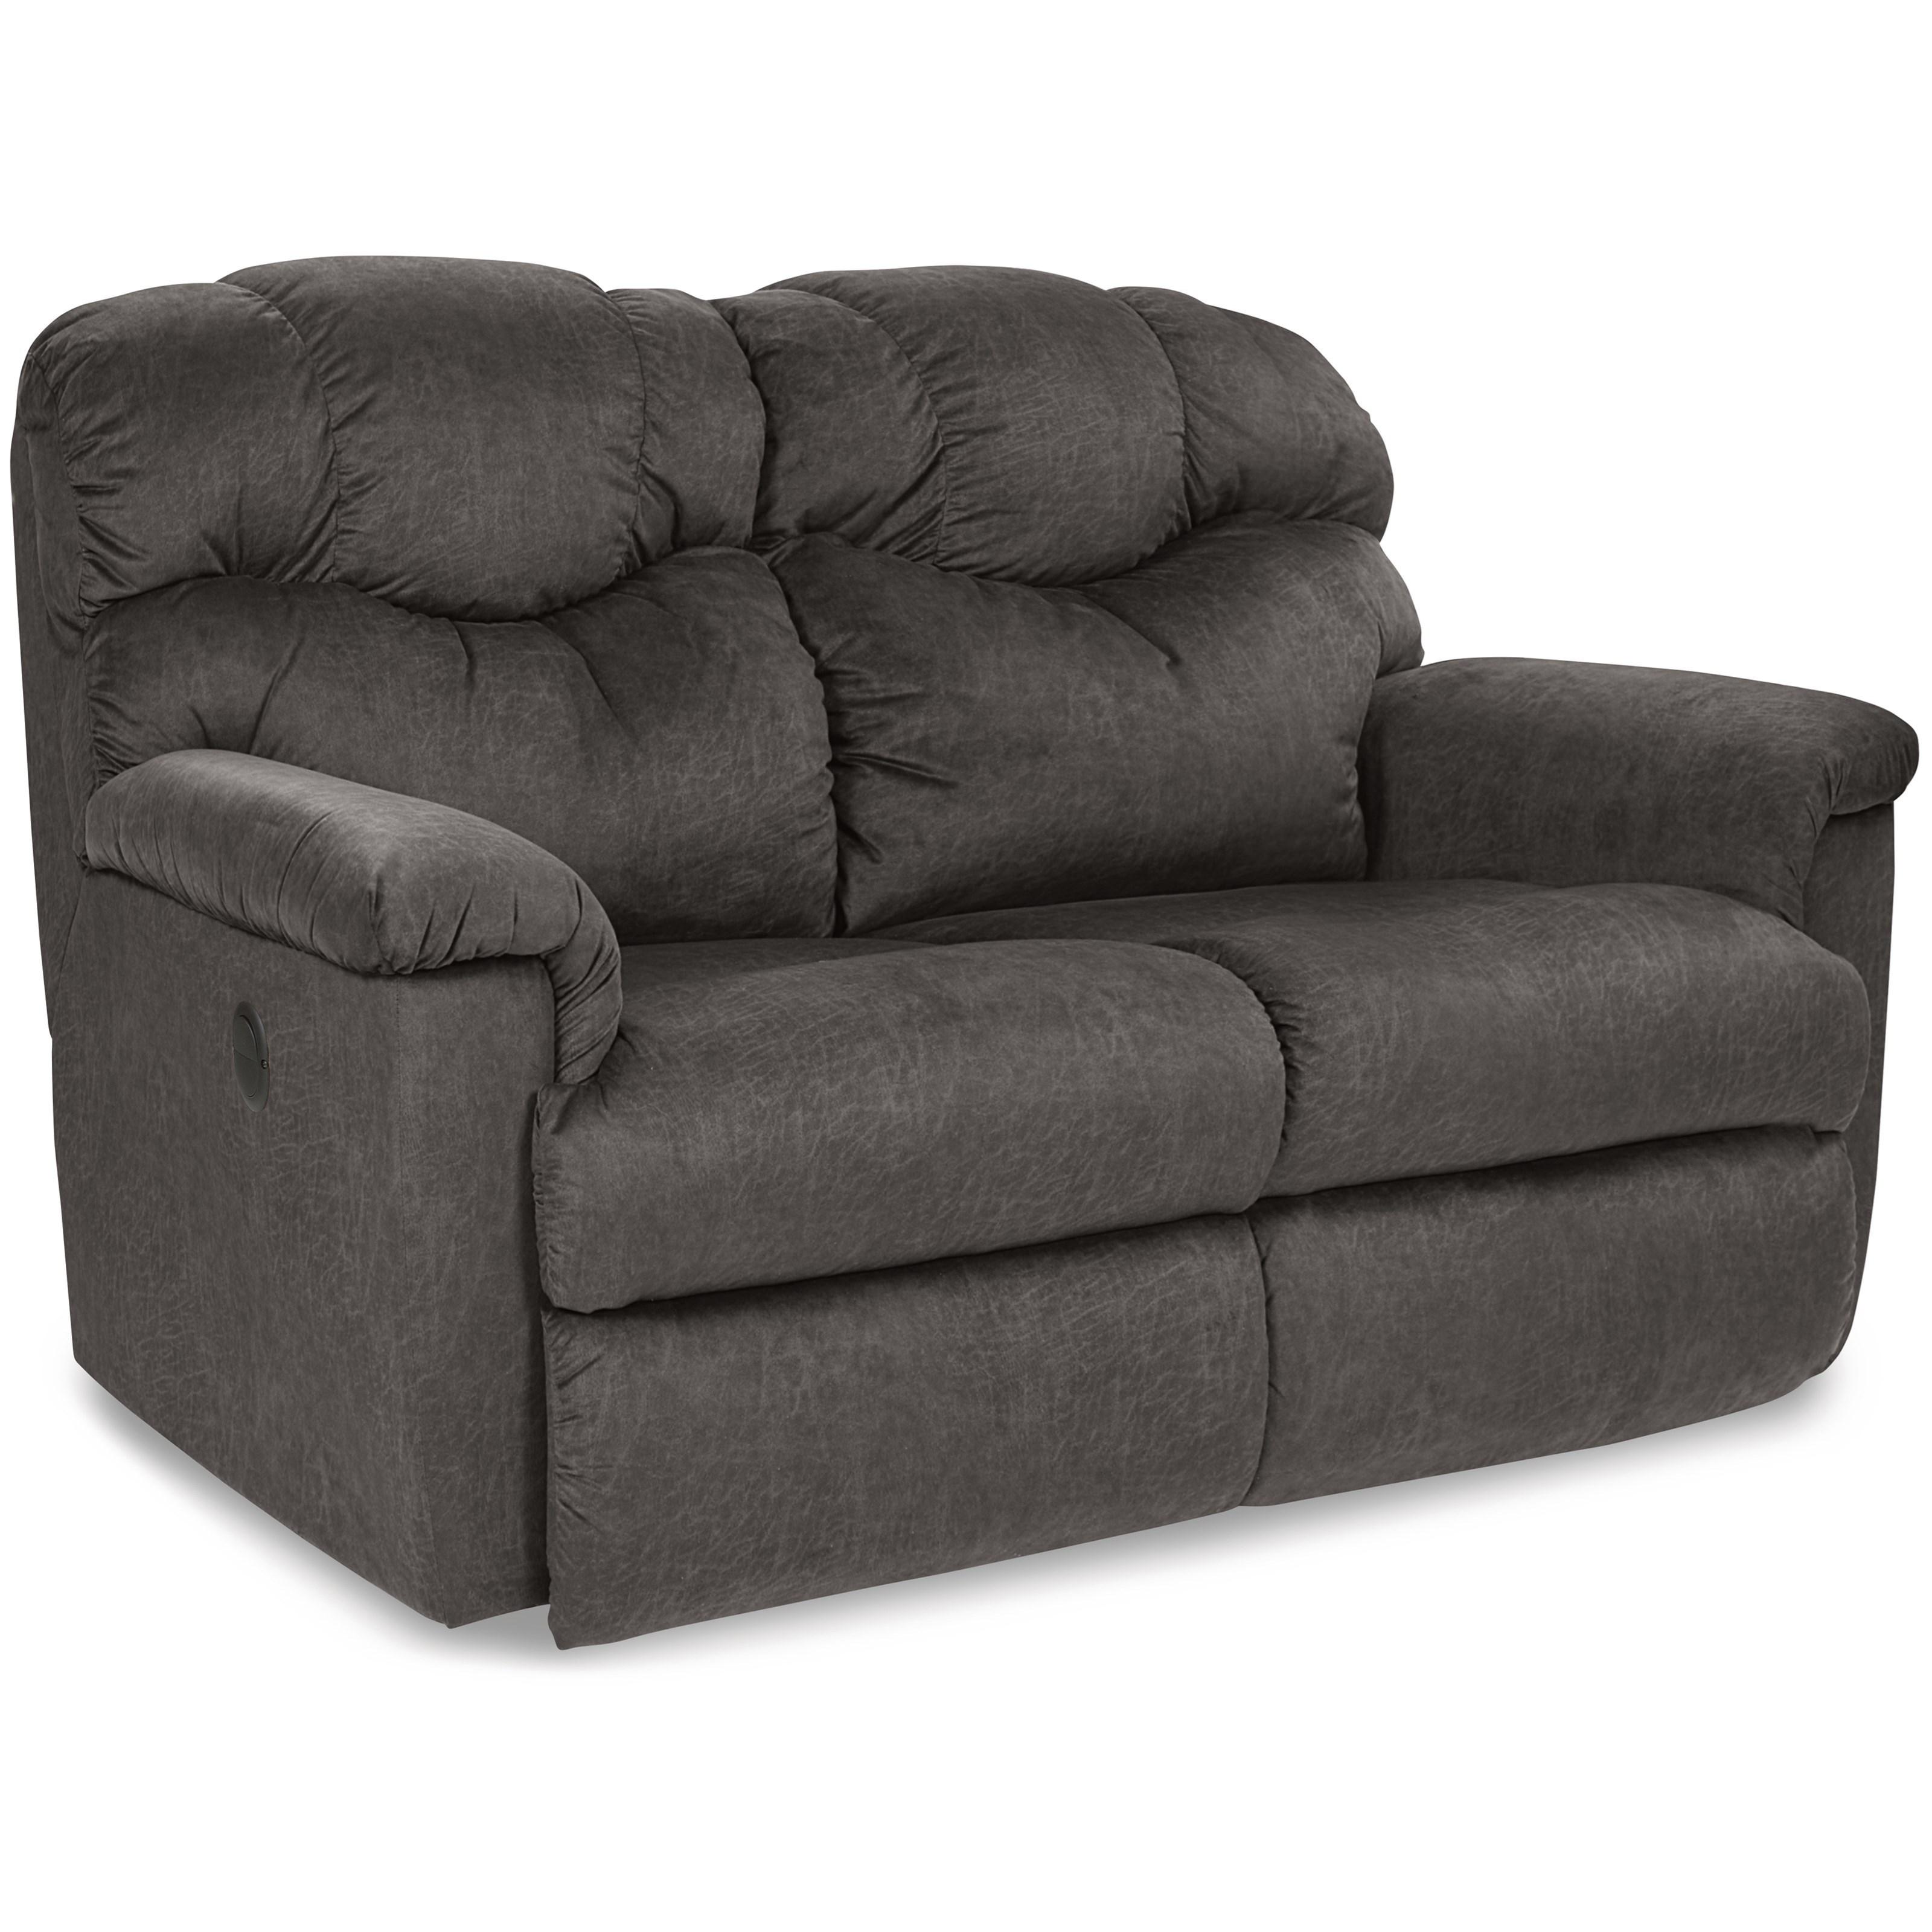 la z boy lancer power la z time full reclining loveseat. Black Bedroom Furniture Sets. Home Design Ideas